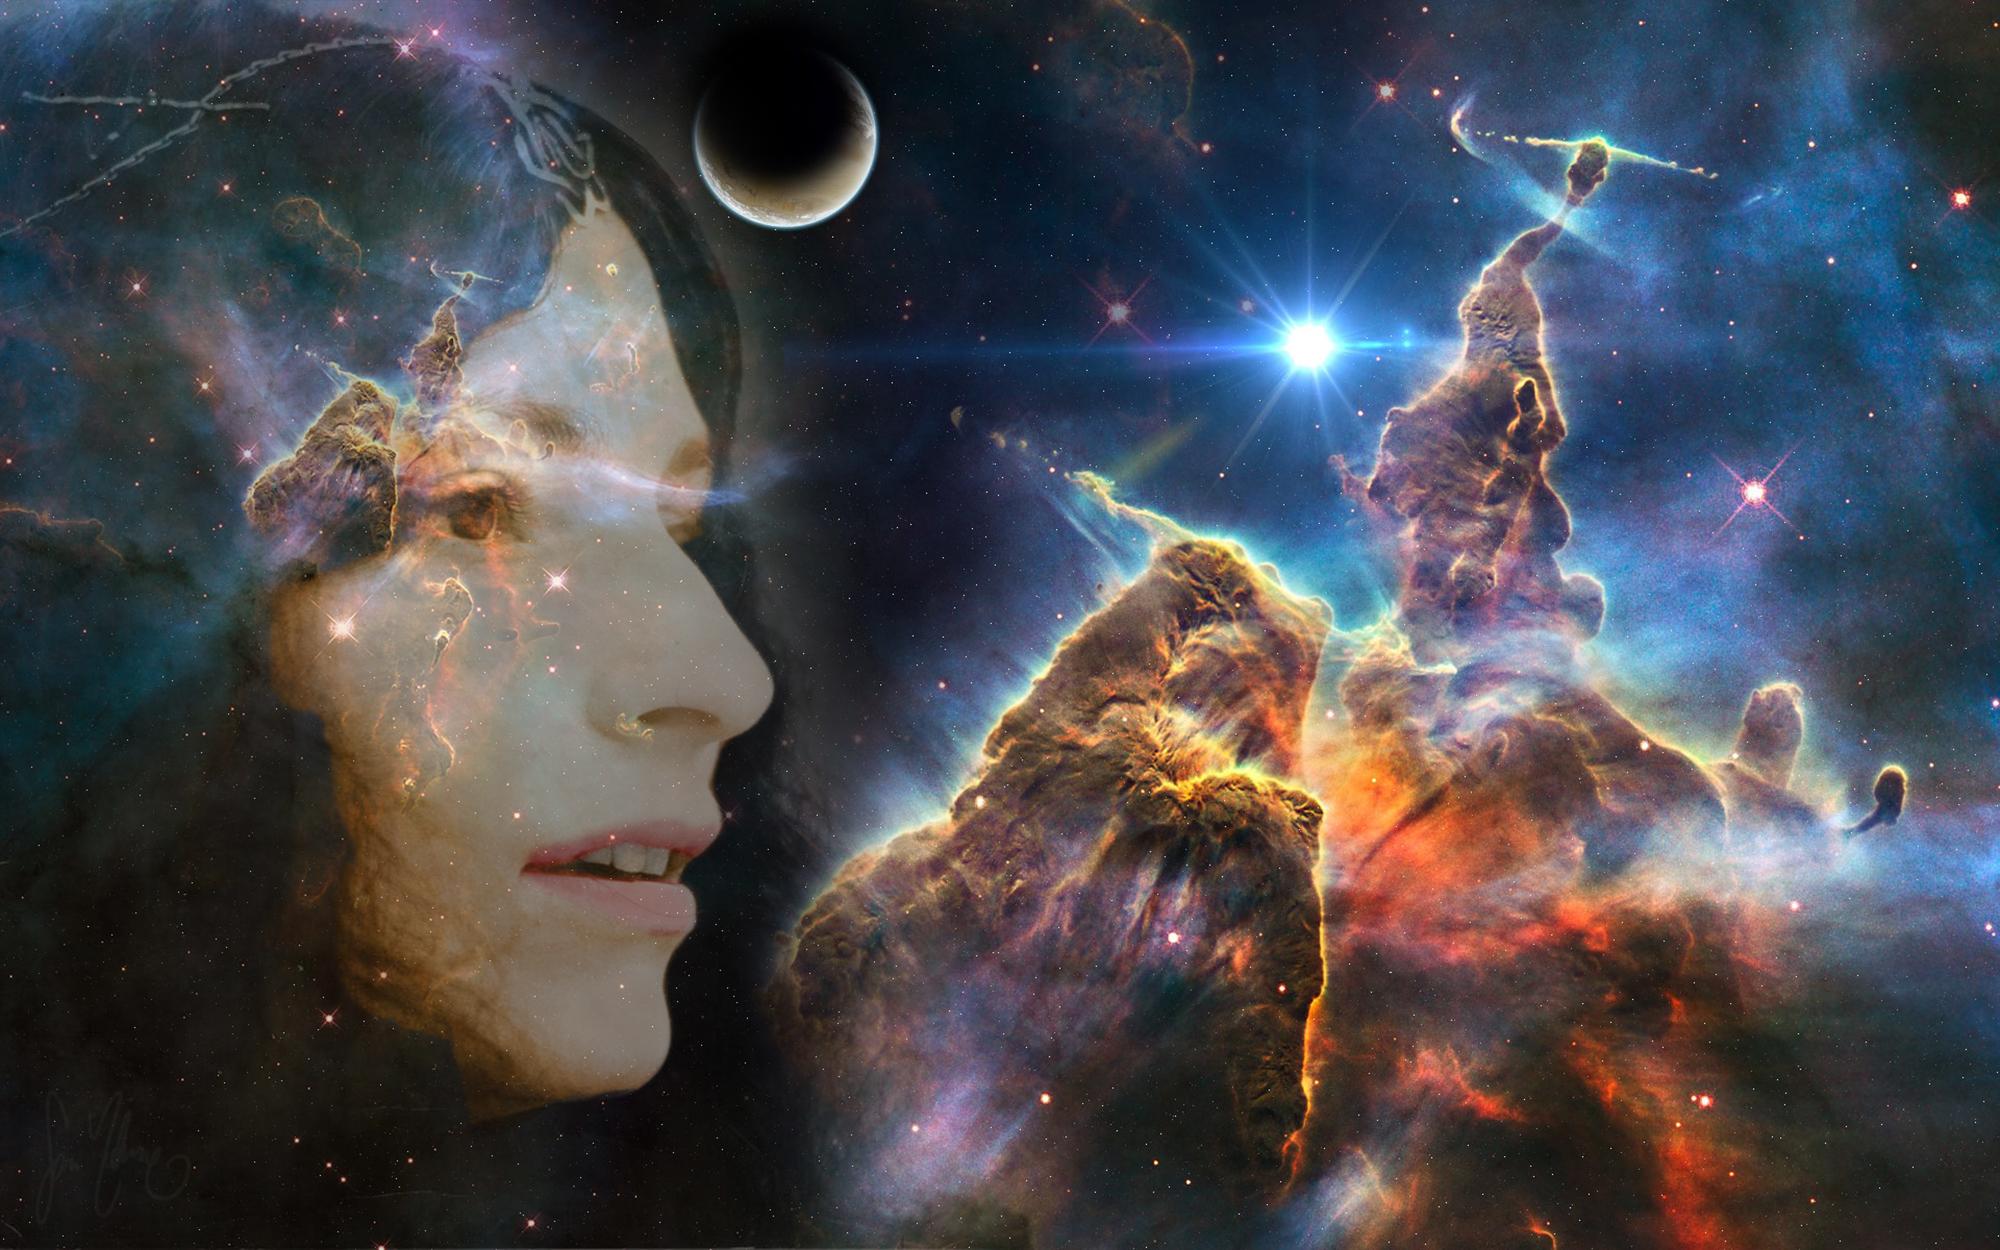 Shekhinah nebula